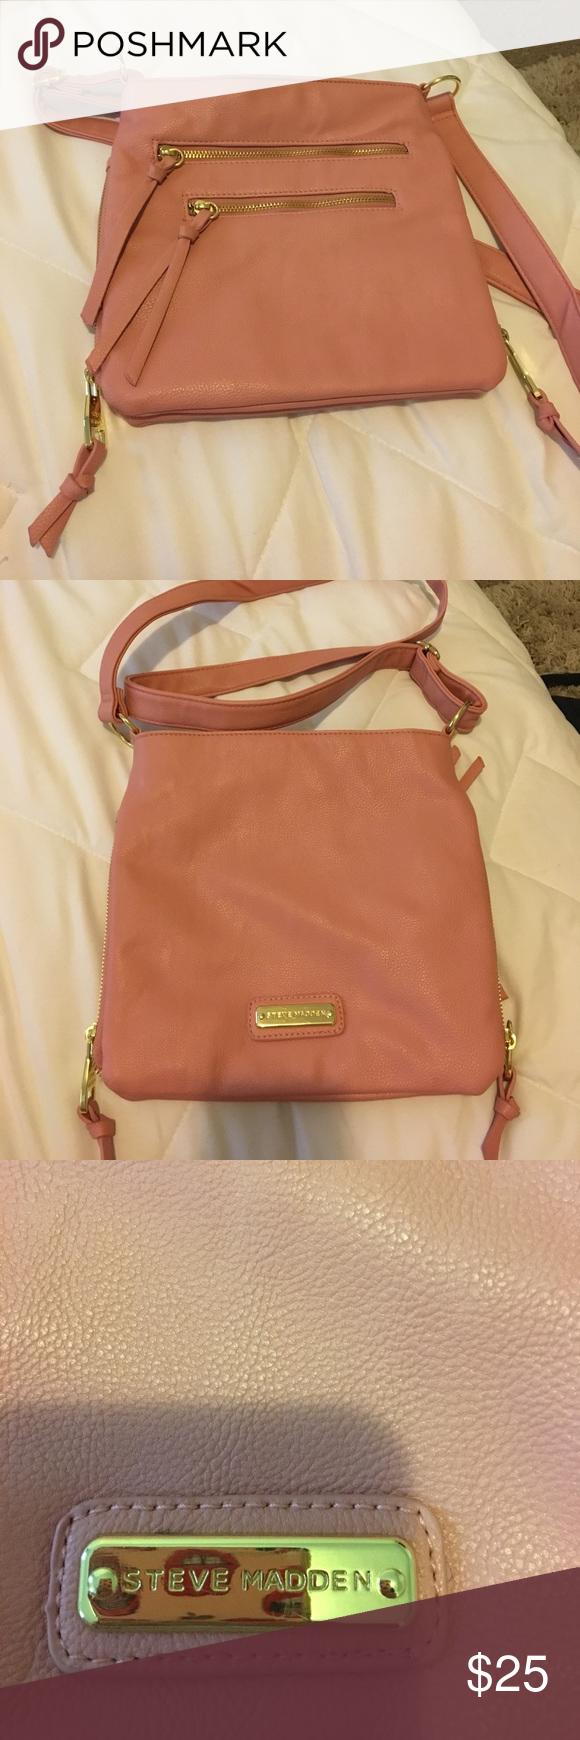 Steve Madden cross-body bag Light pink. Perfect condition, never used. Steve Madden Bags Crossbody Bags